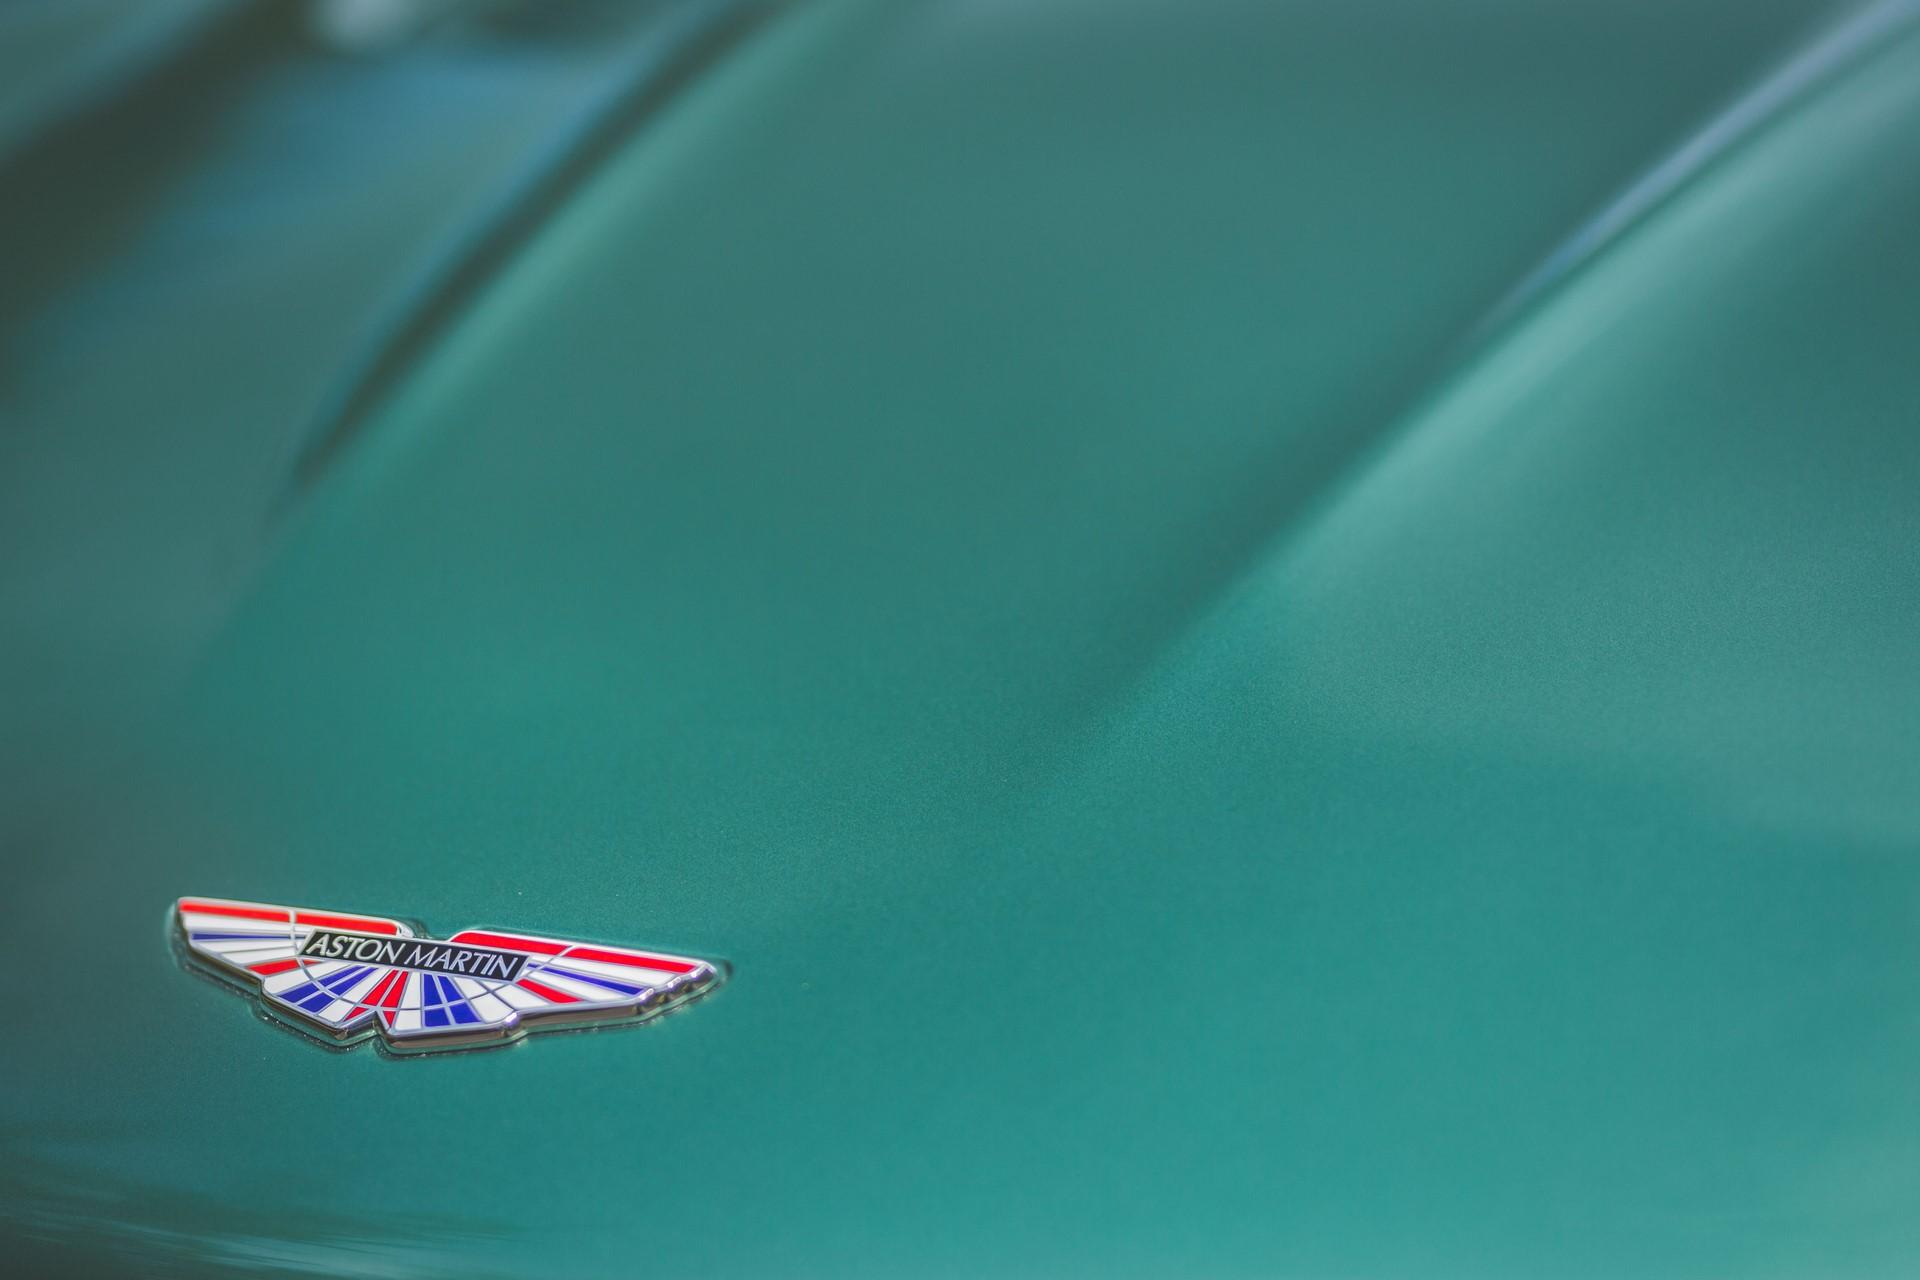 Aston-Martin-DBS-59-Edition-4